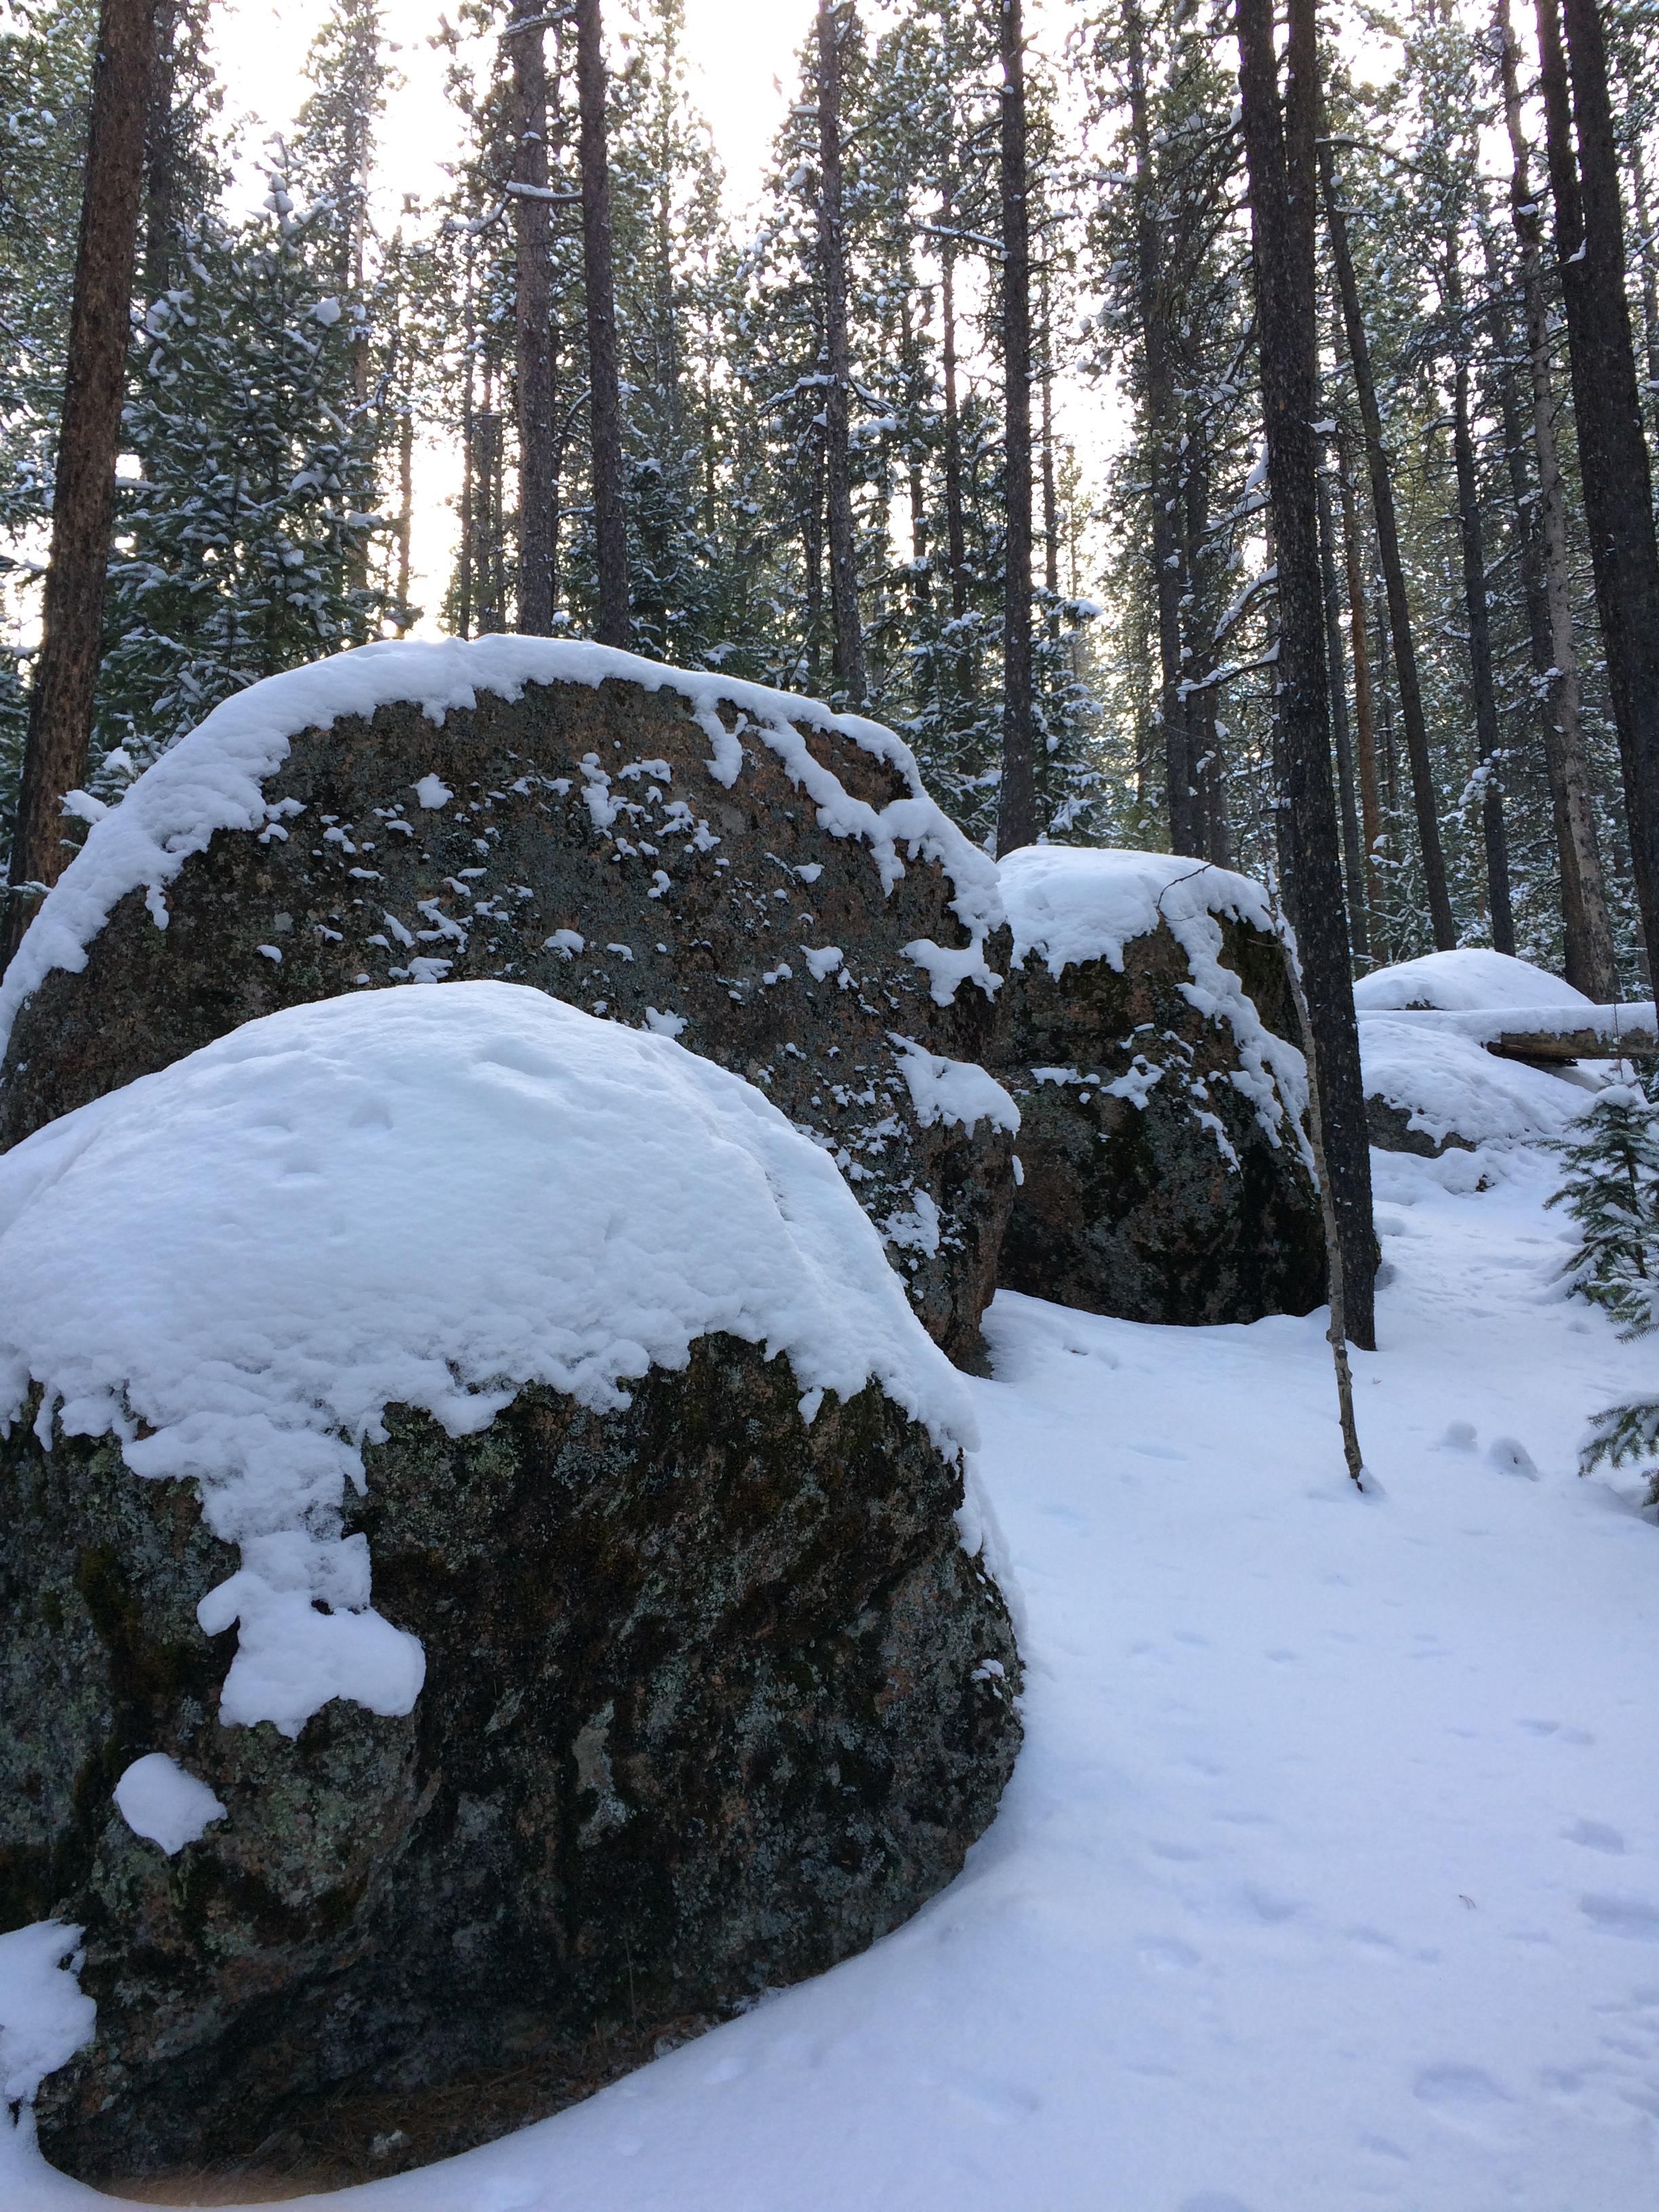 Snow blanketed boulders.